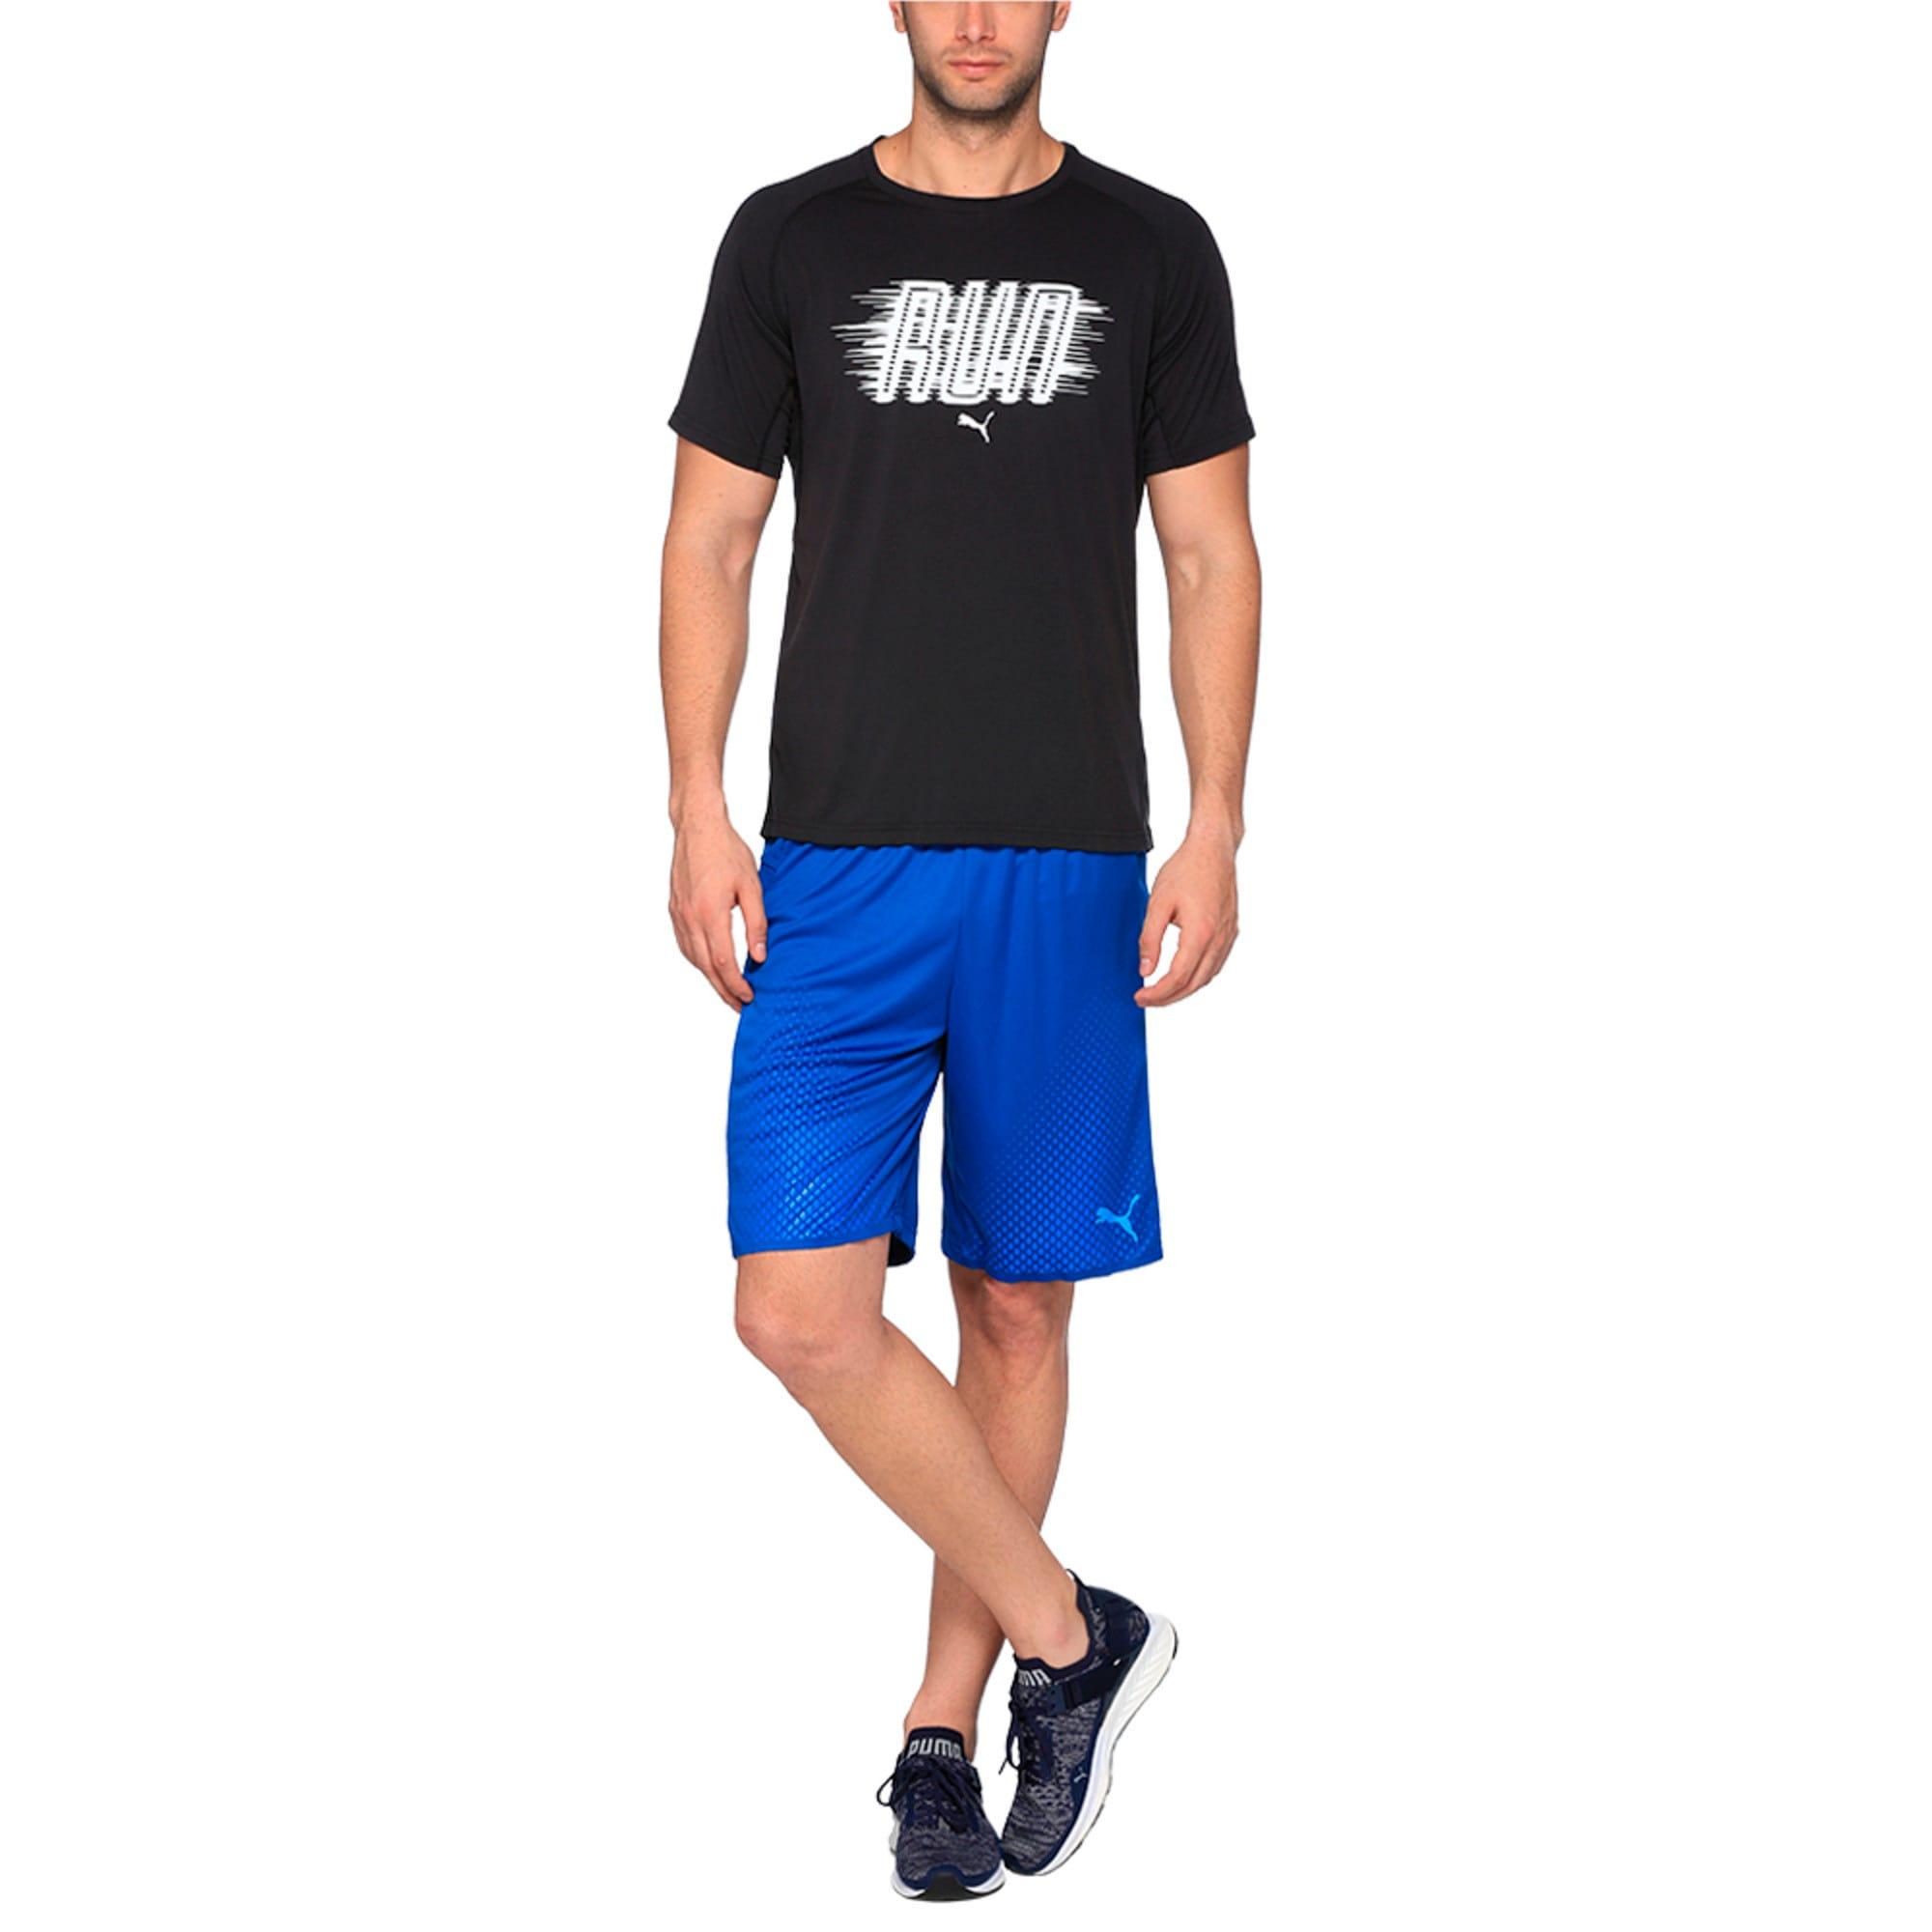 Thumbnail 4 of Running Men's Run T-Shirt, Puma Black Heather, medium-IND